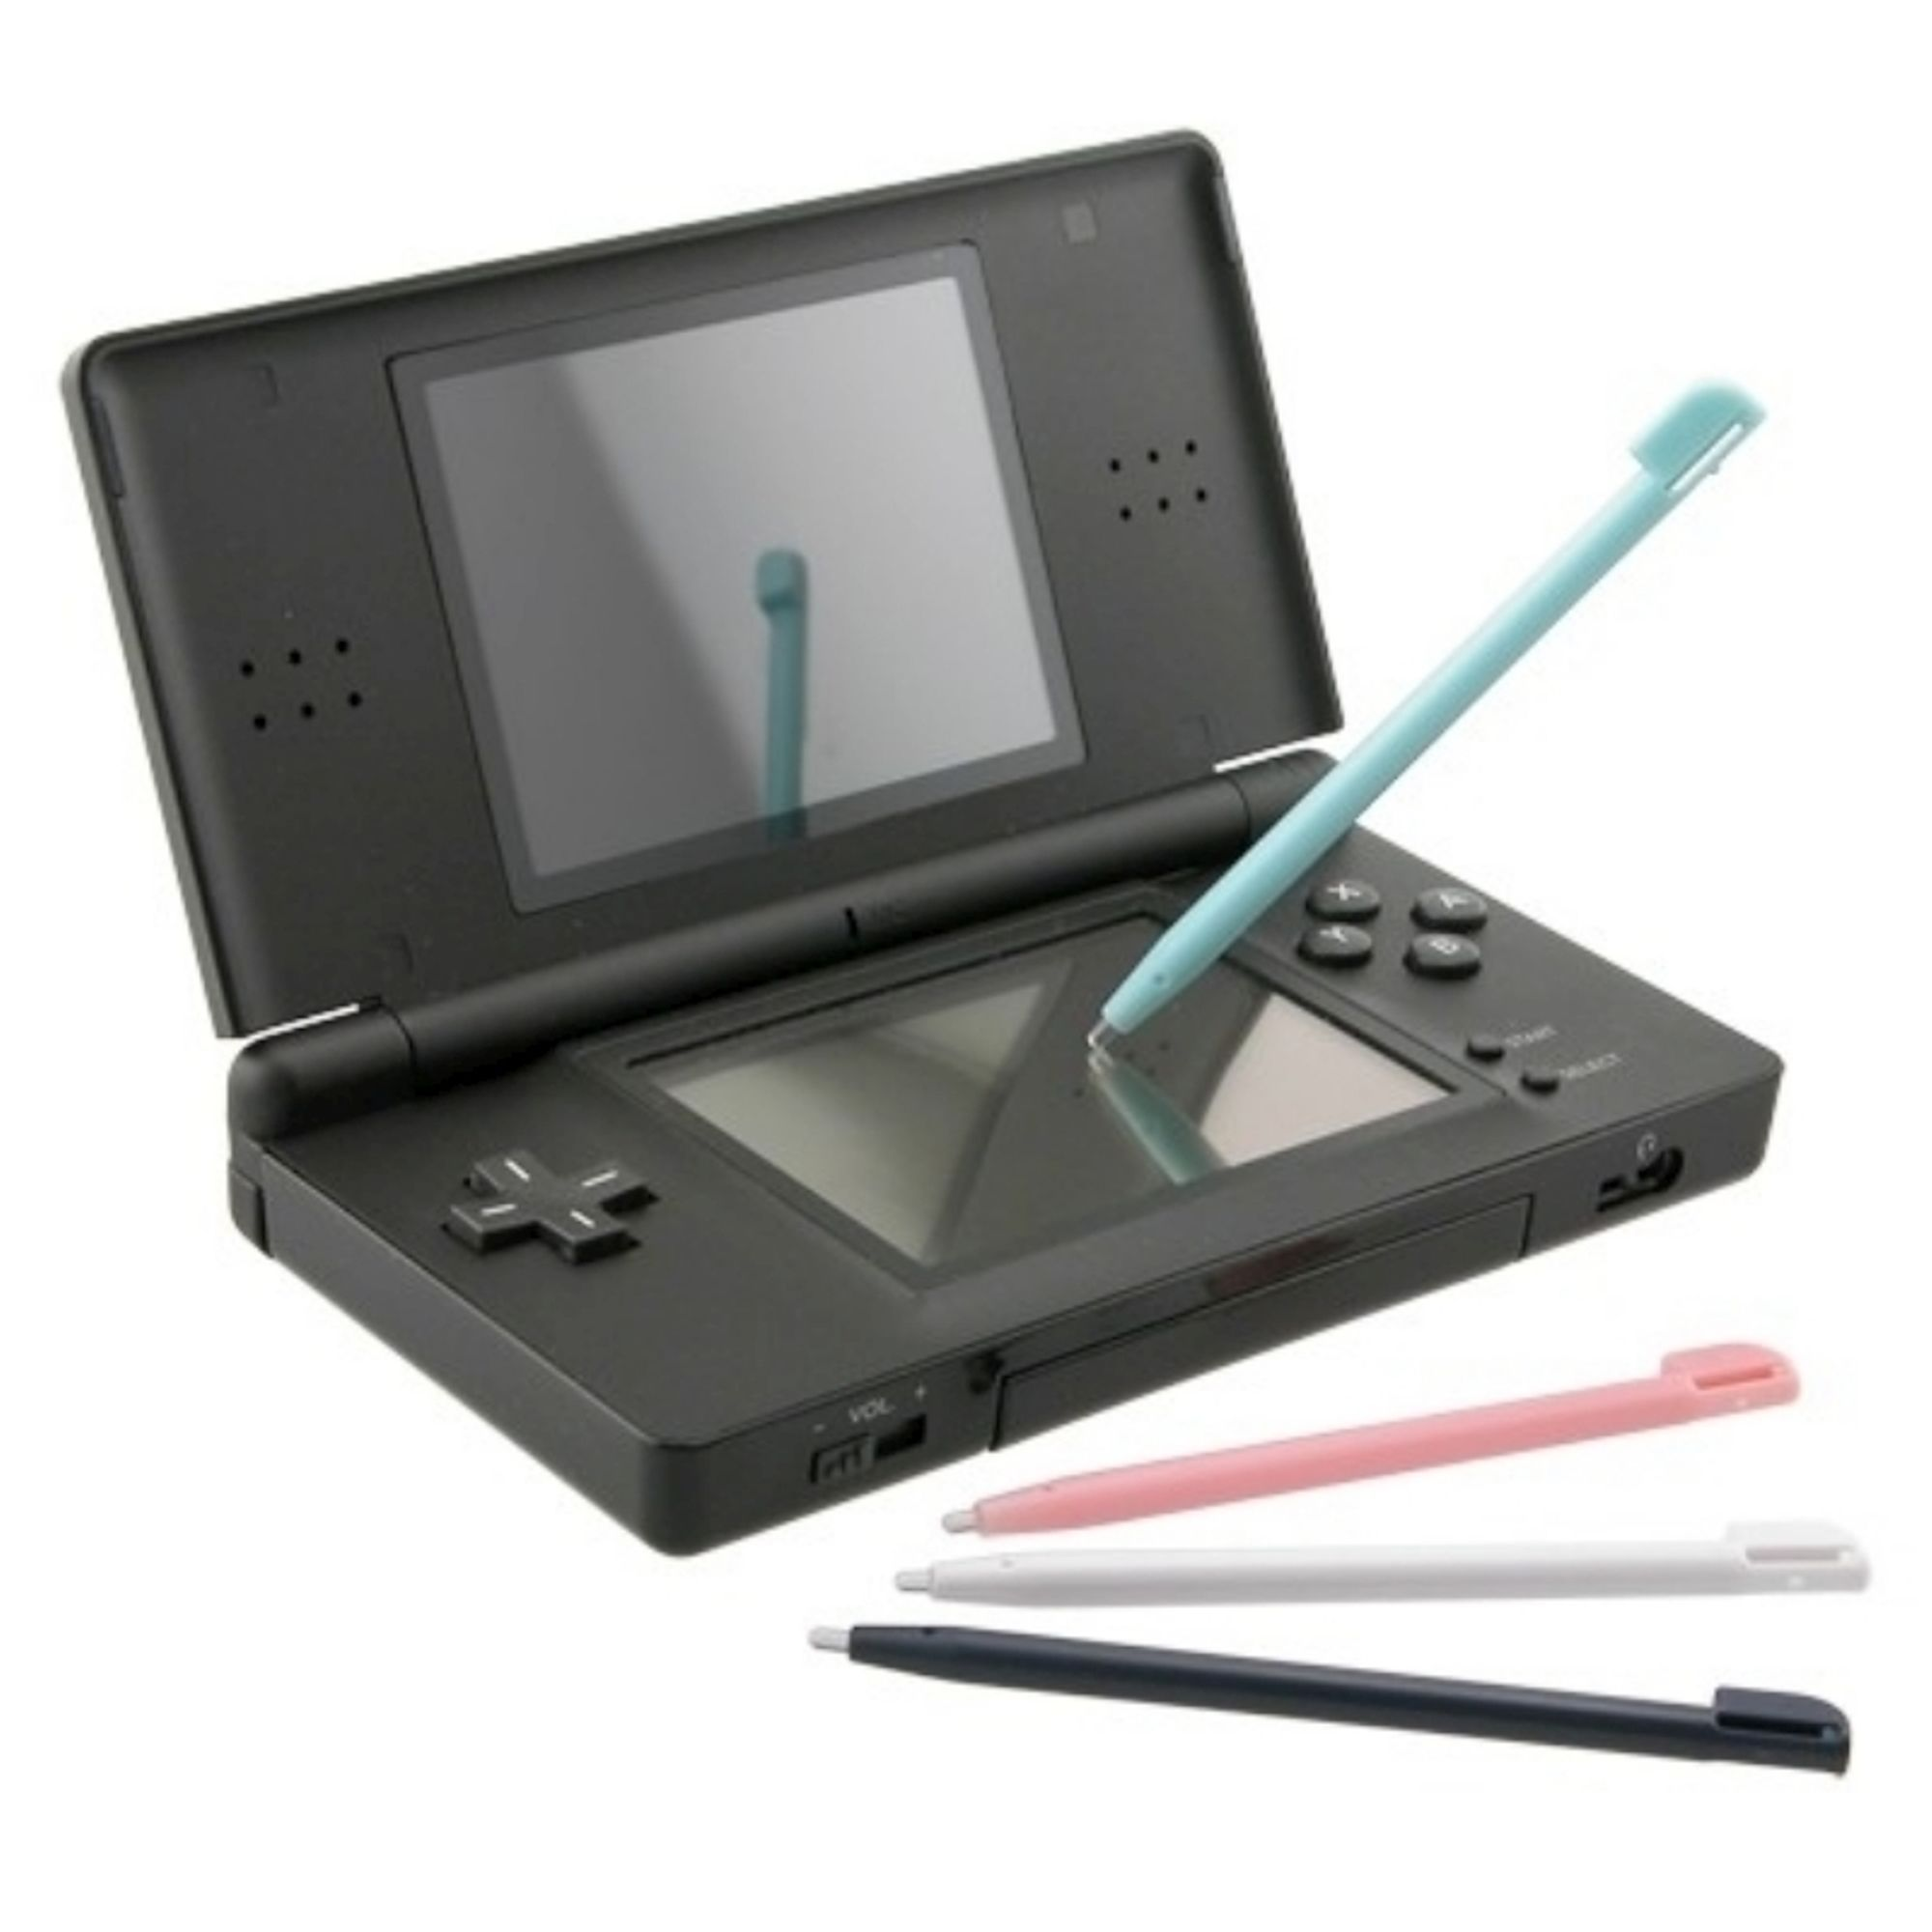 80 Pack Nintendo DS Light Stylus ( 4 Colours ) by Insten